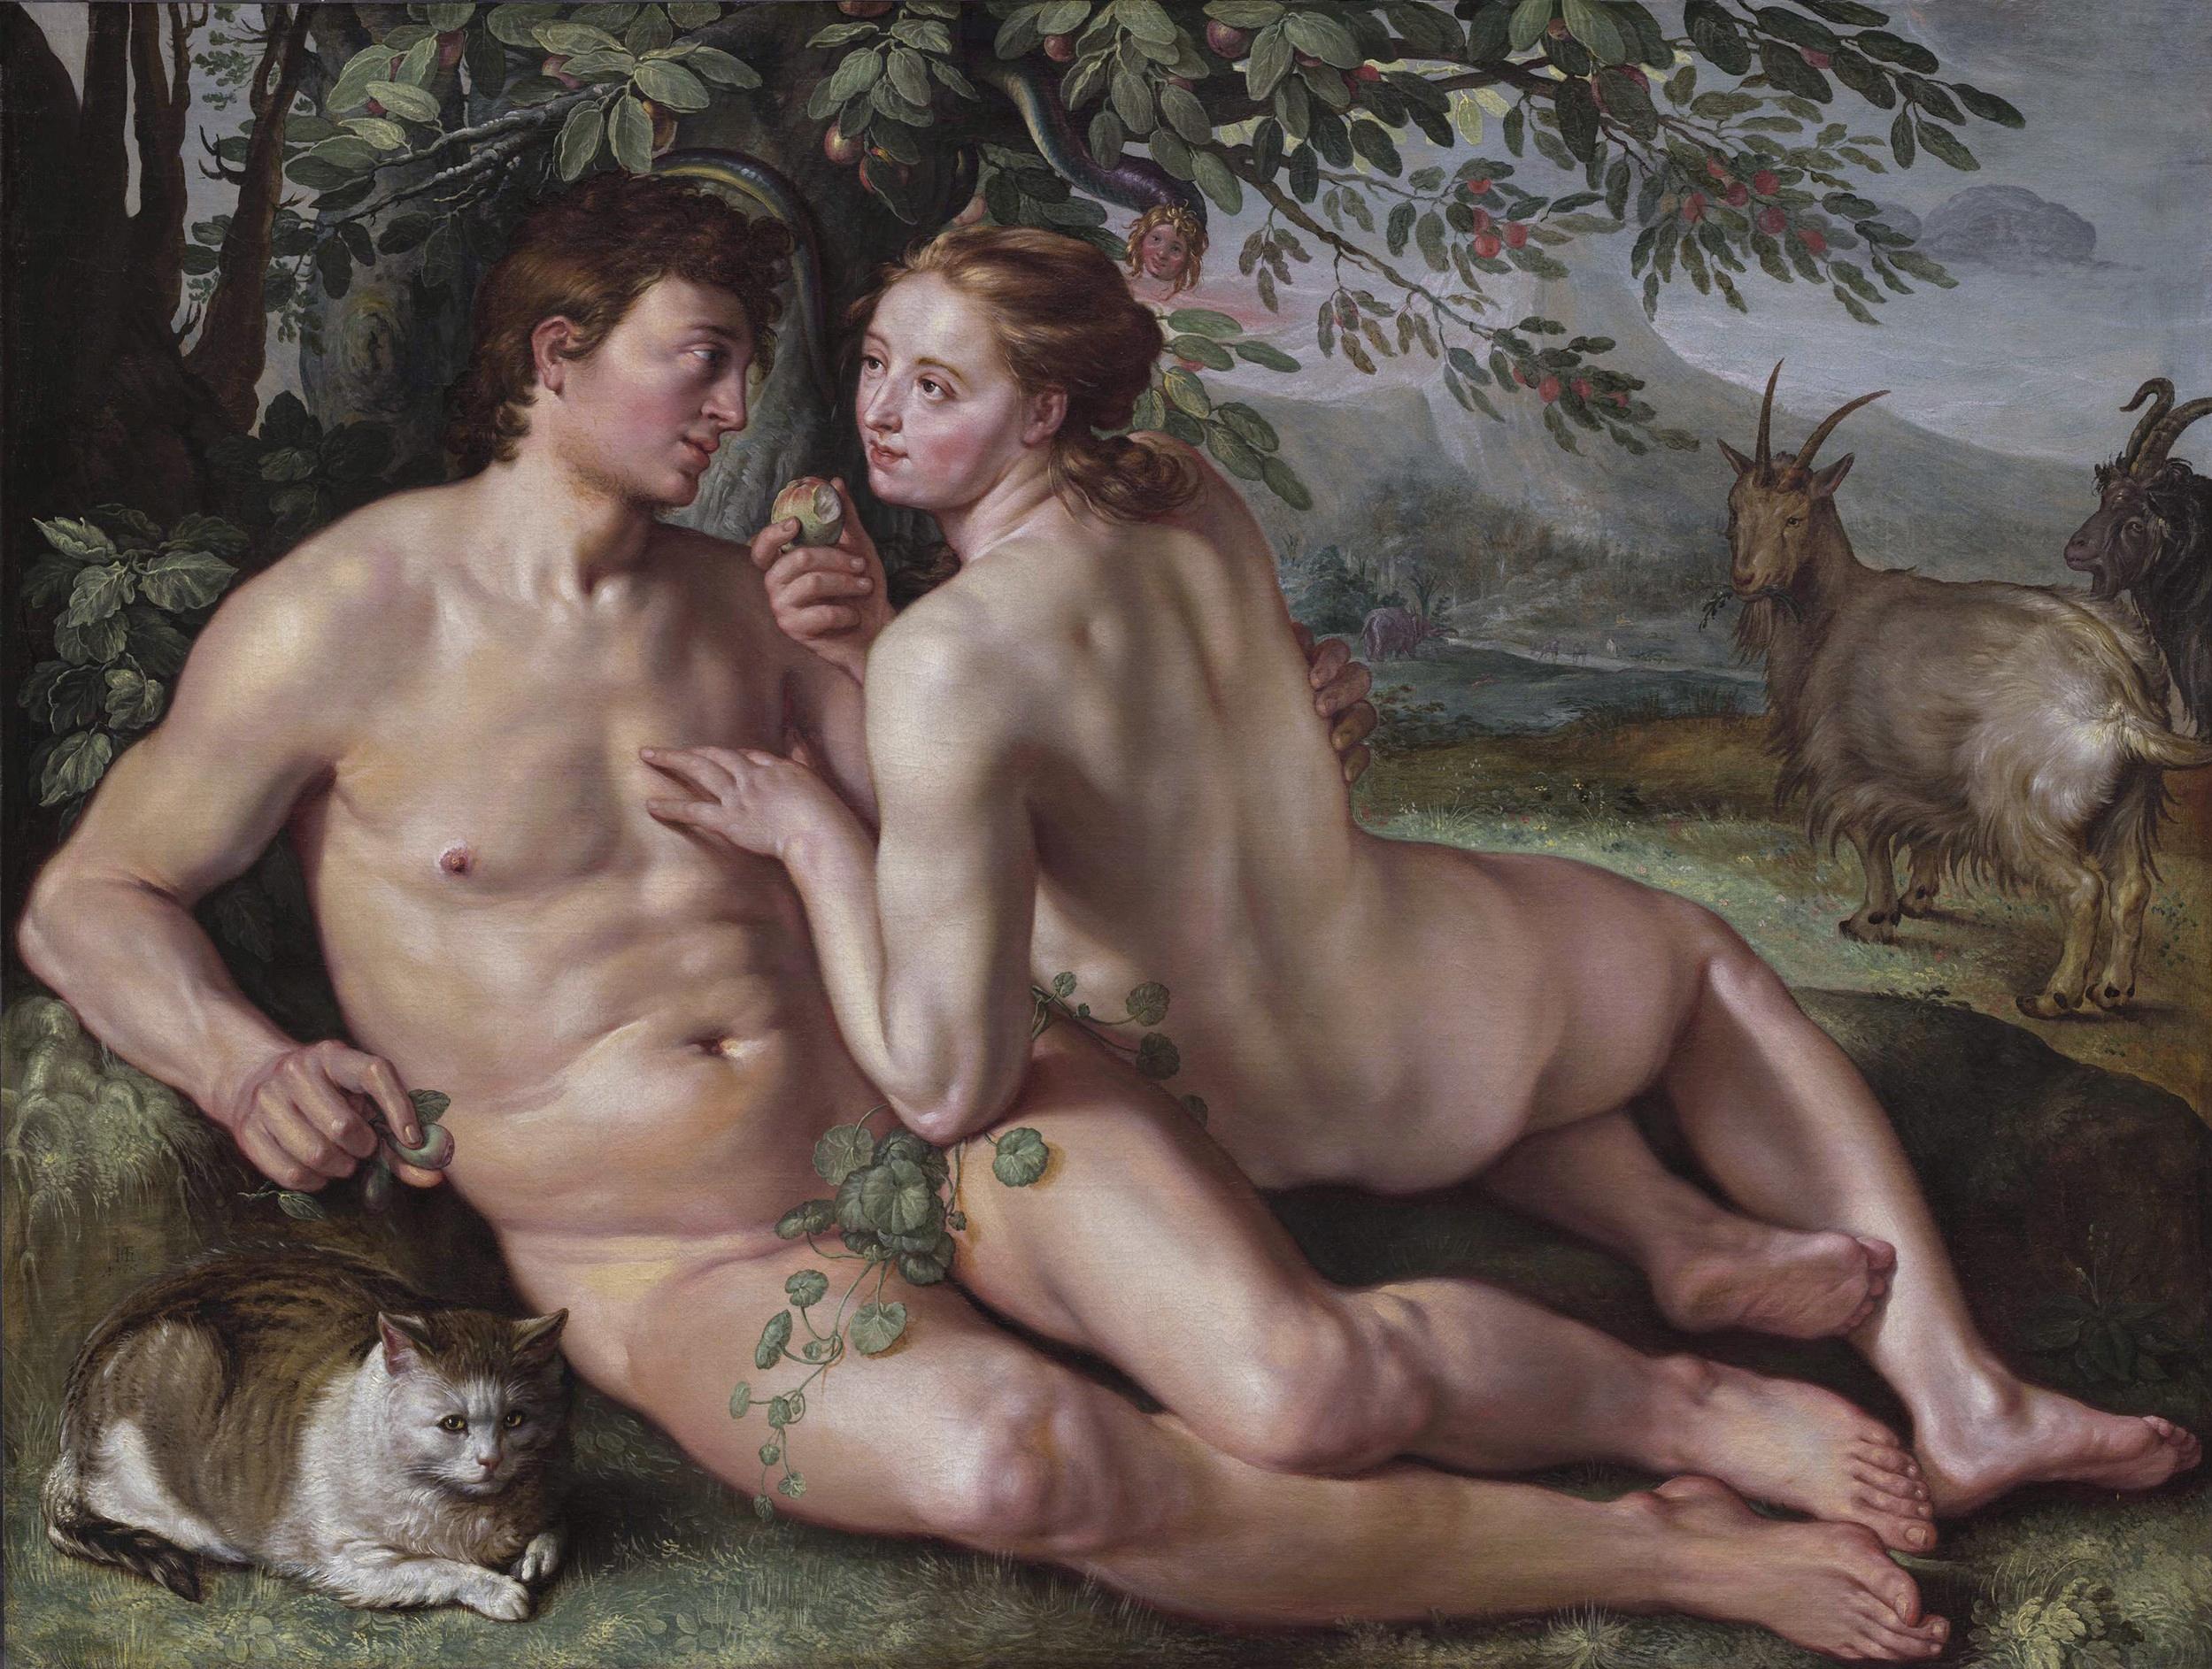 1616_The_Fall_of_Man_Hendrik_Goltzius